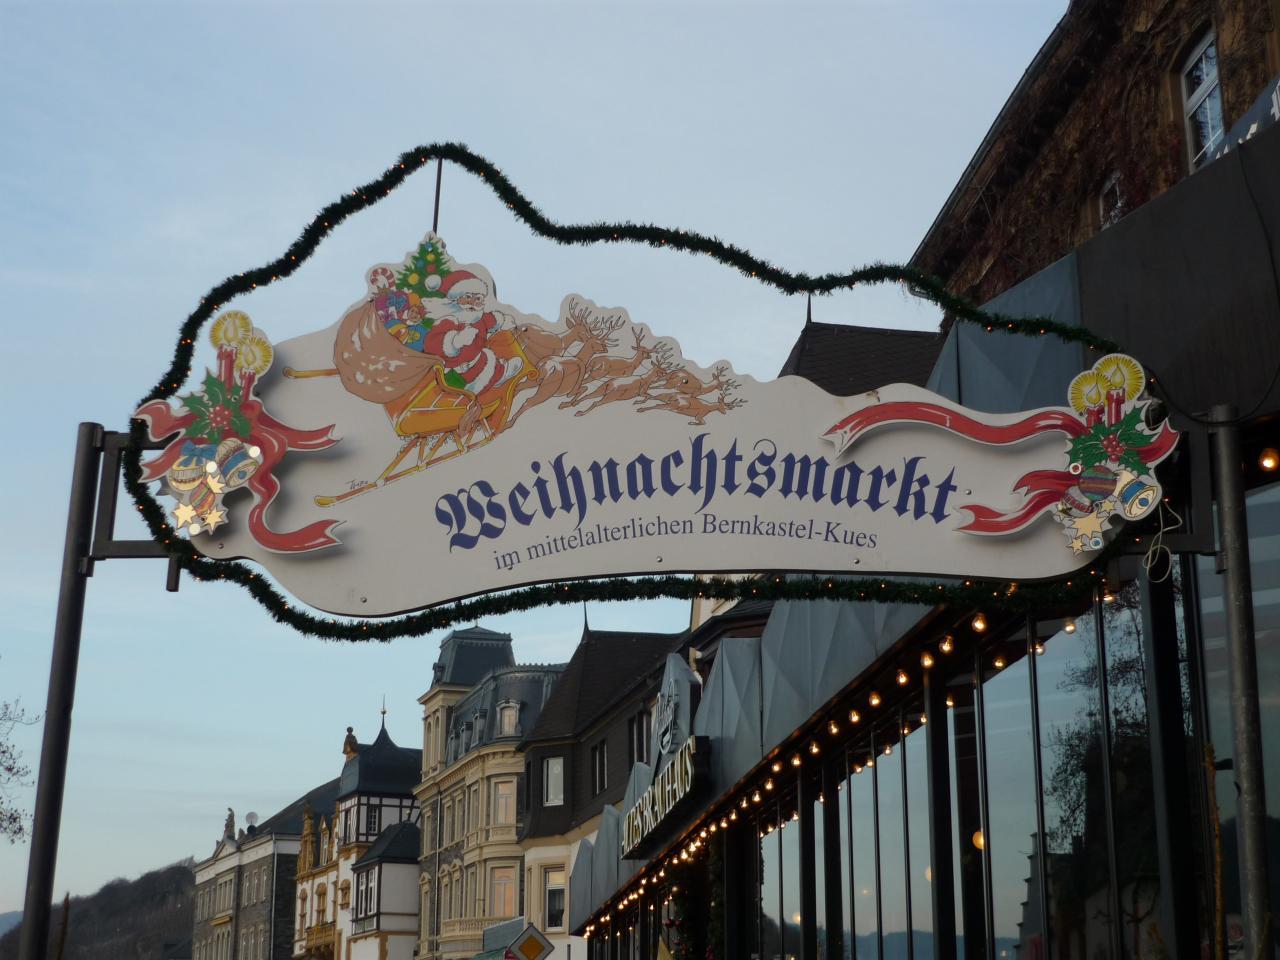 Marché de Noël de Bernkastel